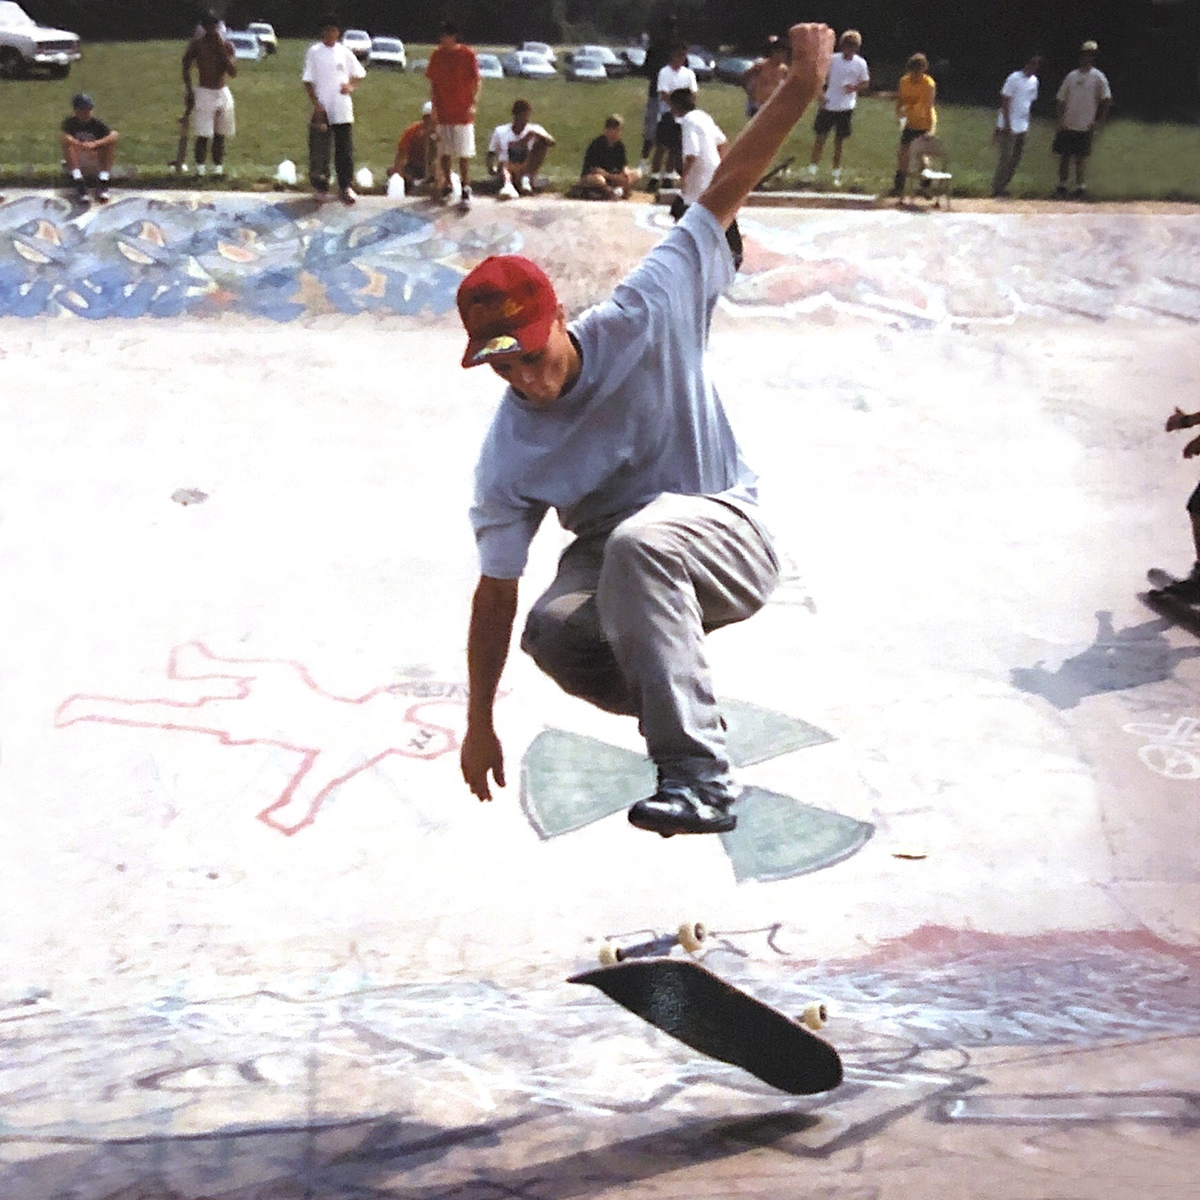 Chris-Hall-360-flip-to-fakie-Landsdowne-new-deal-skateboards.JPG